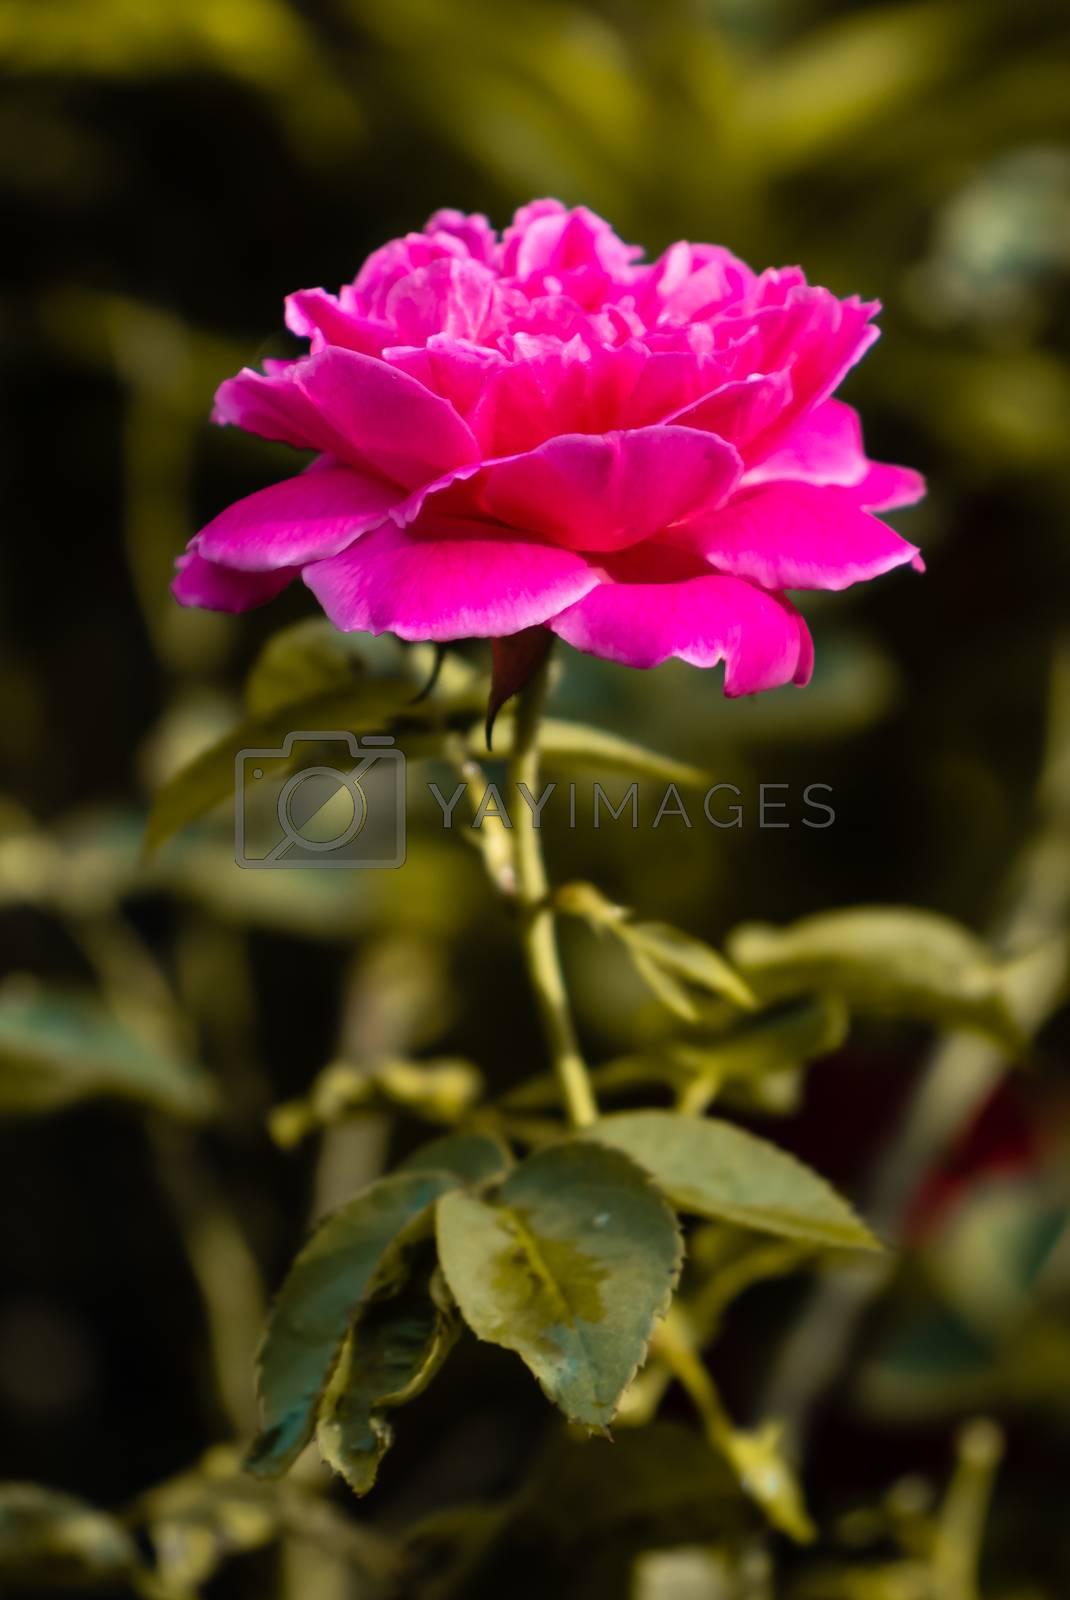 Garden Rose bloom in the early sun light